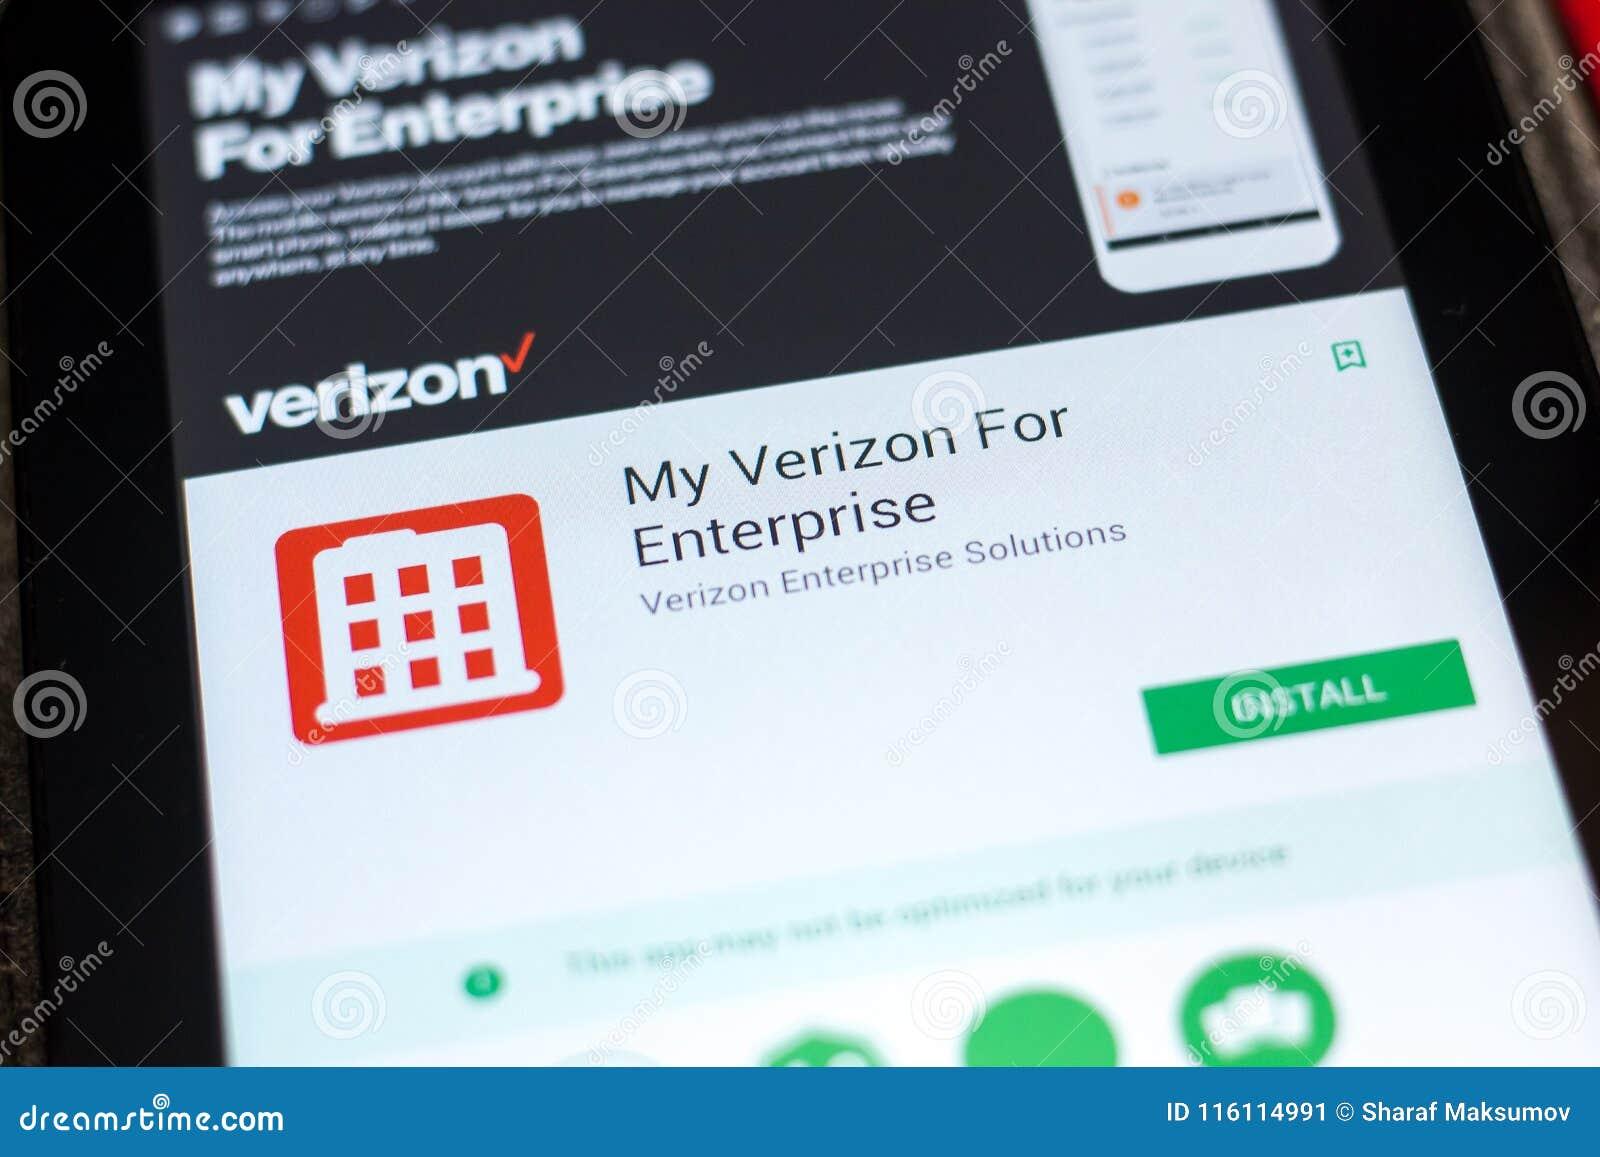 Ryazan, Russia - May 02, 2018: My Verizon For Enterprise